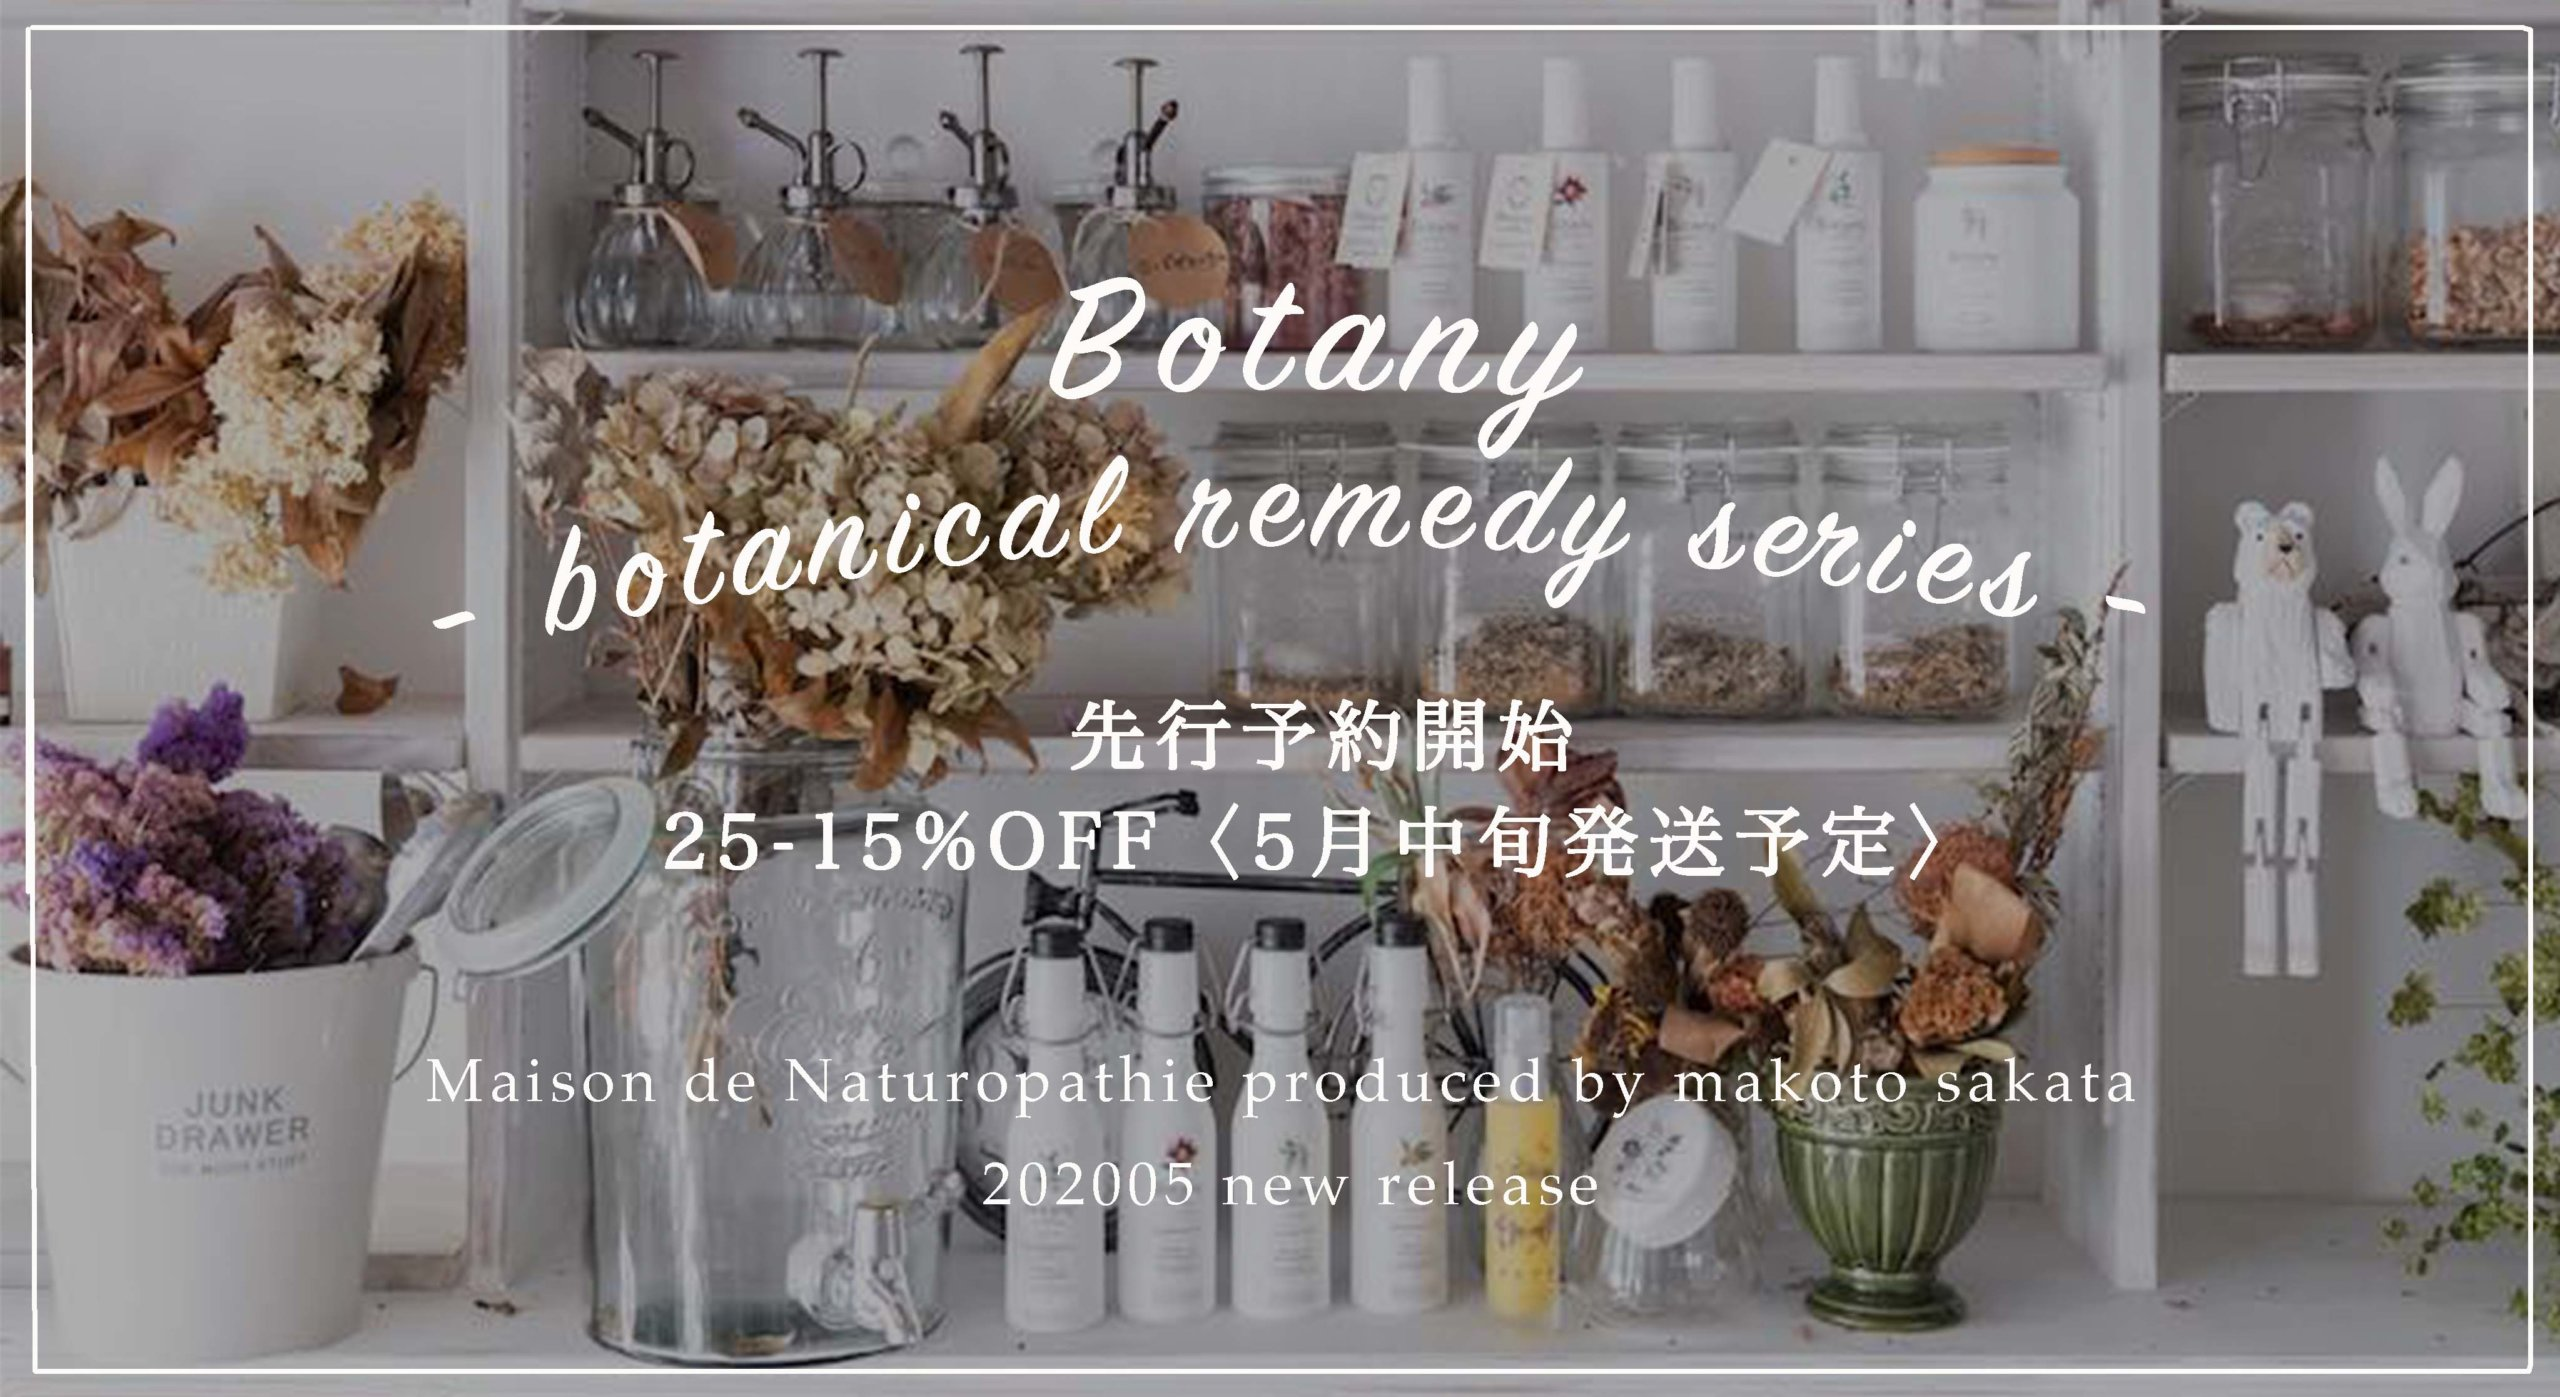 Botany - botanical remedy series -